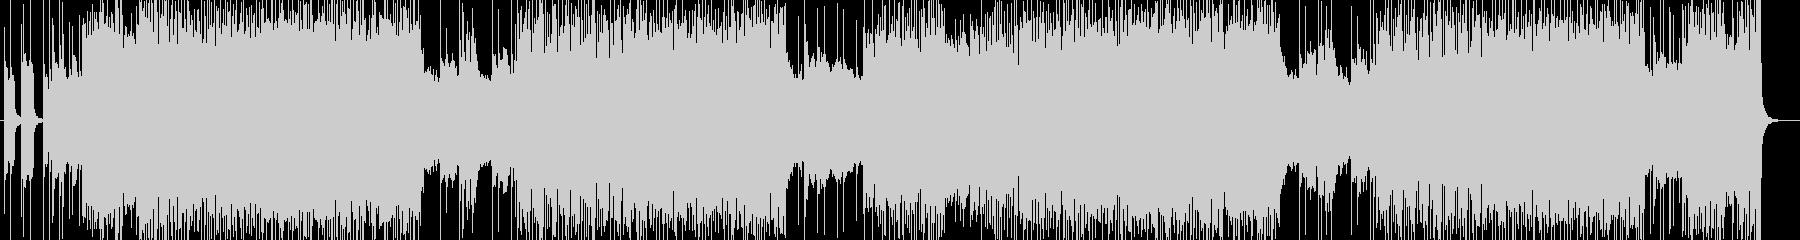 「HR/HM」「DEATH」BGM147の未再生の波形